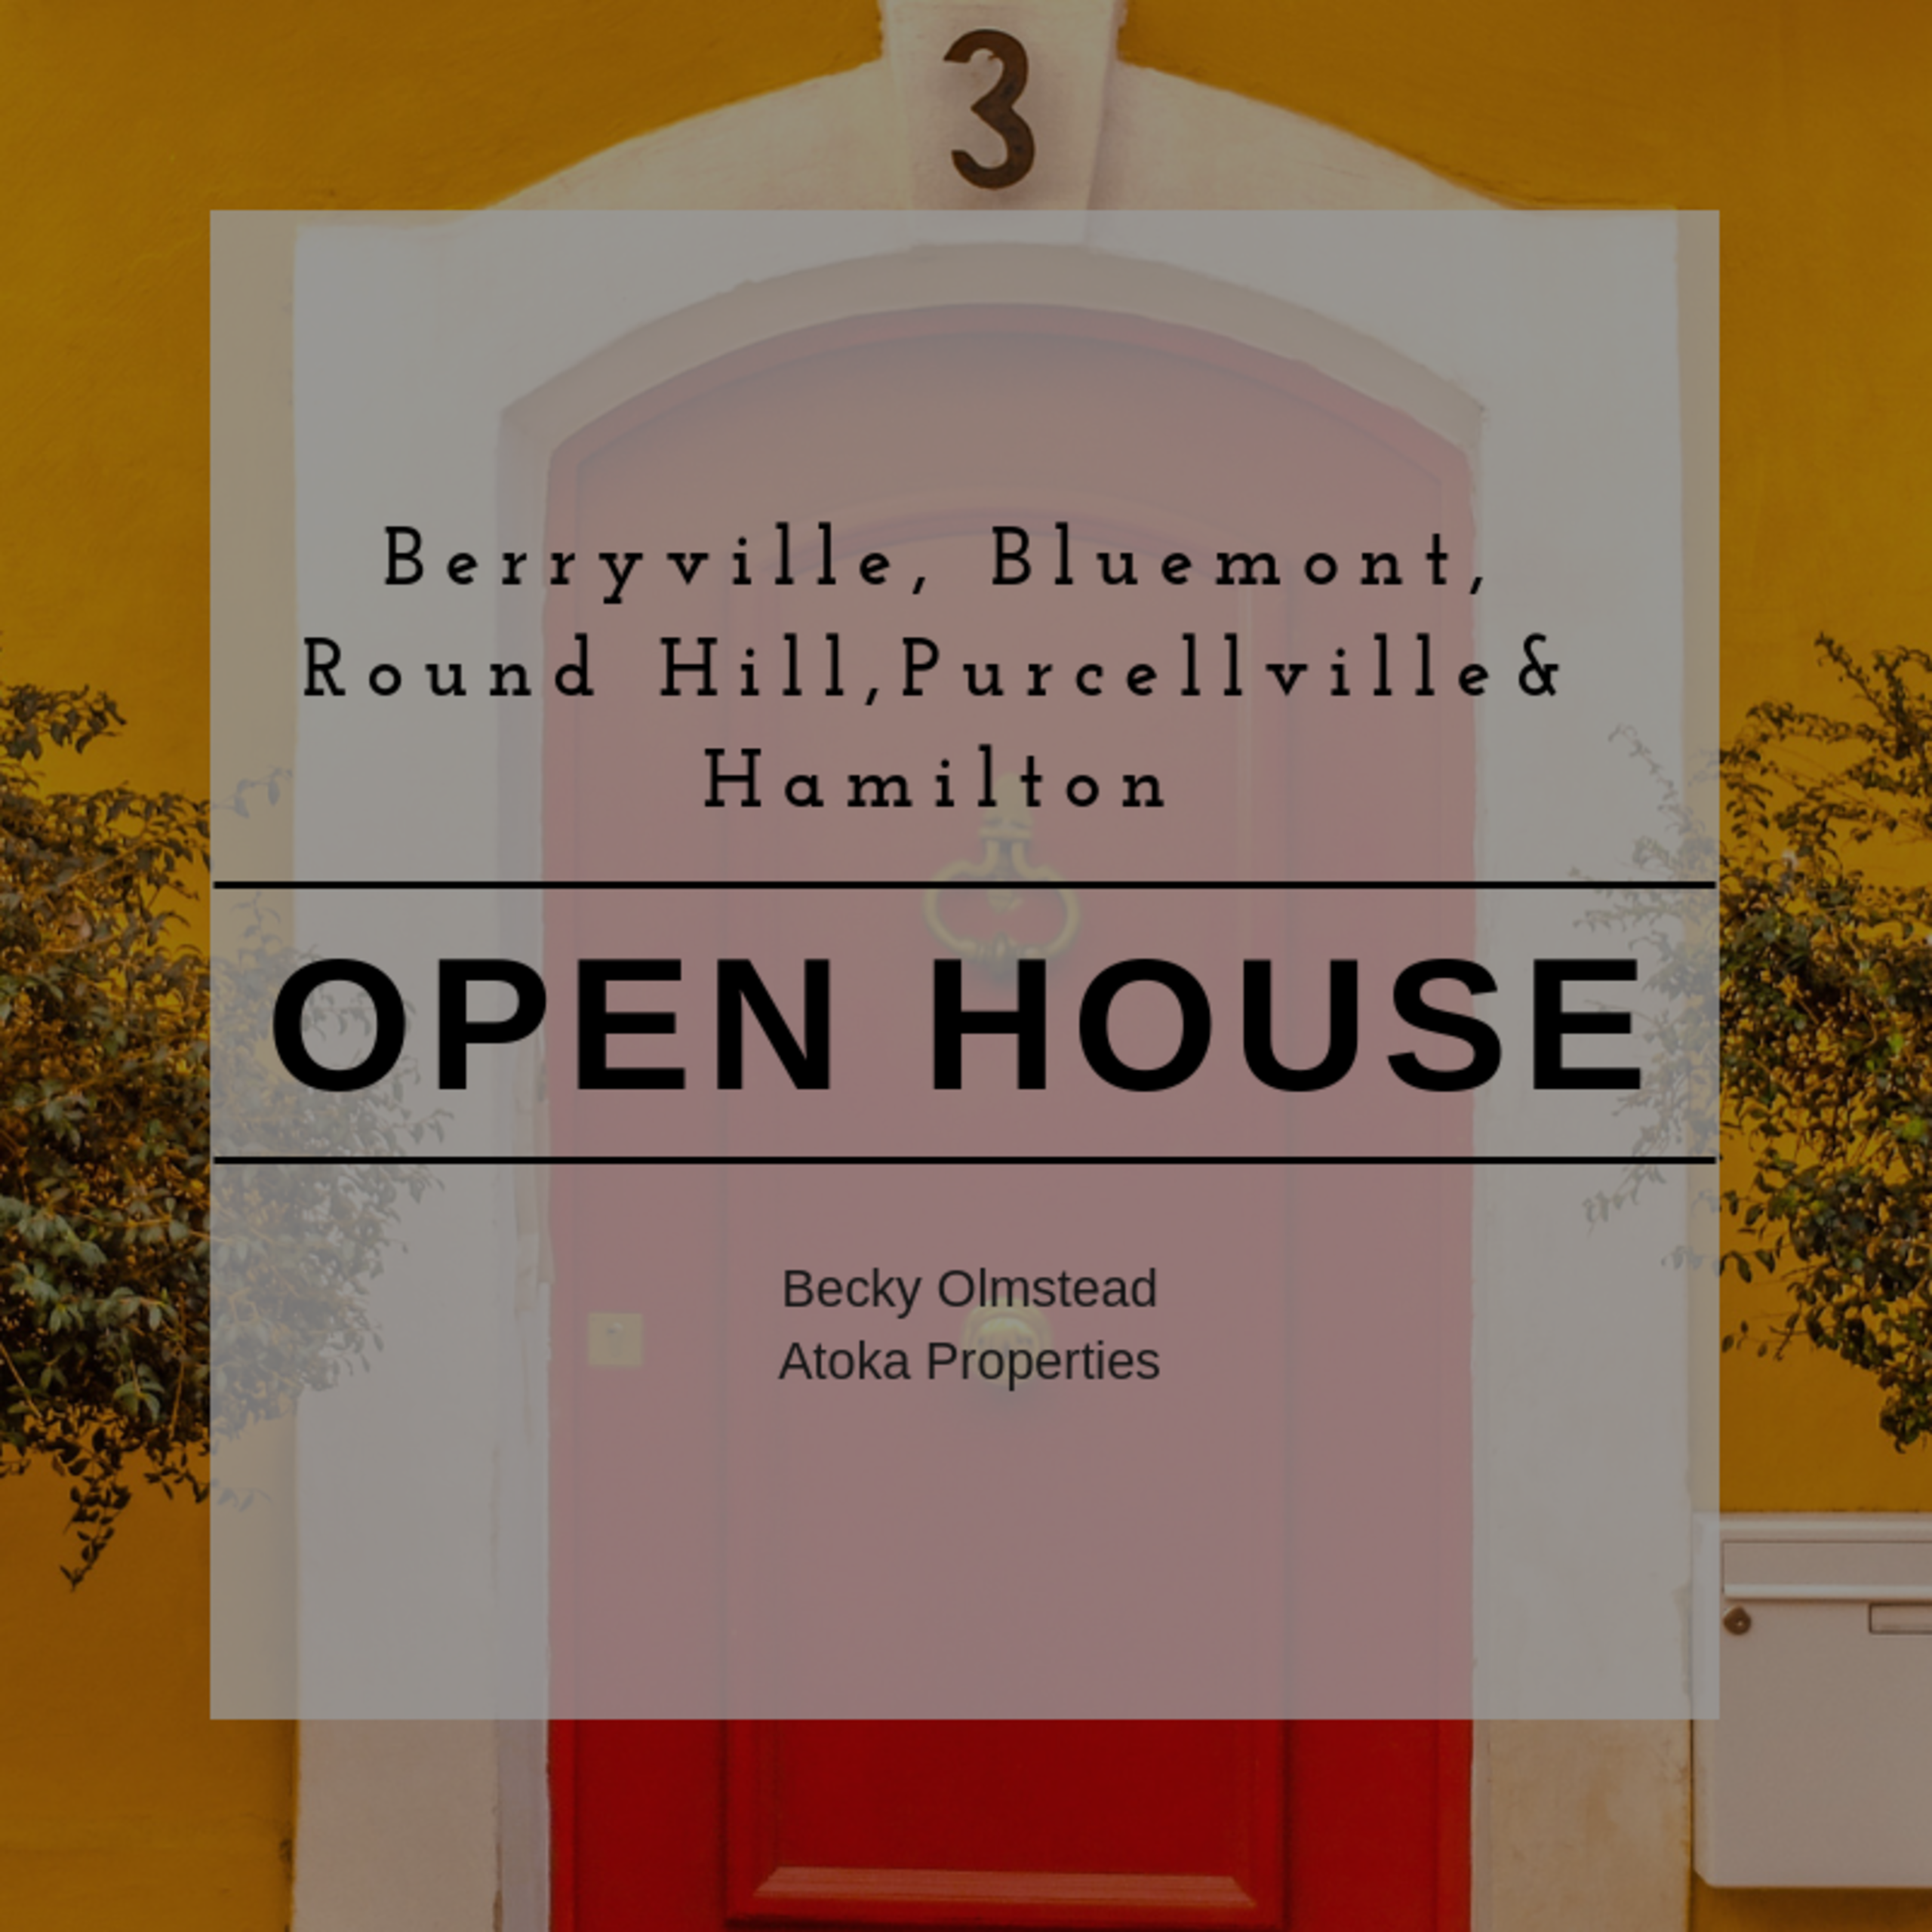 OPEN HOUSE LIST 9/29/18 – 9/30/18